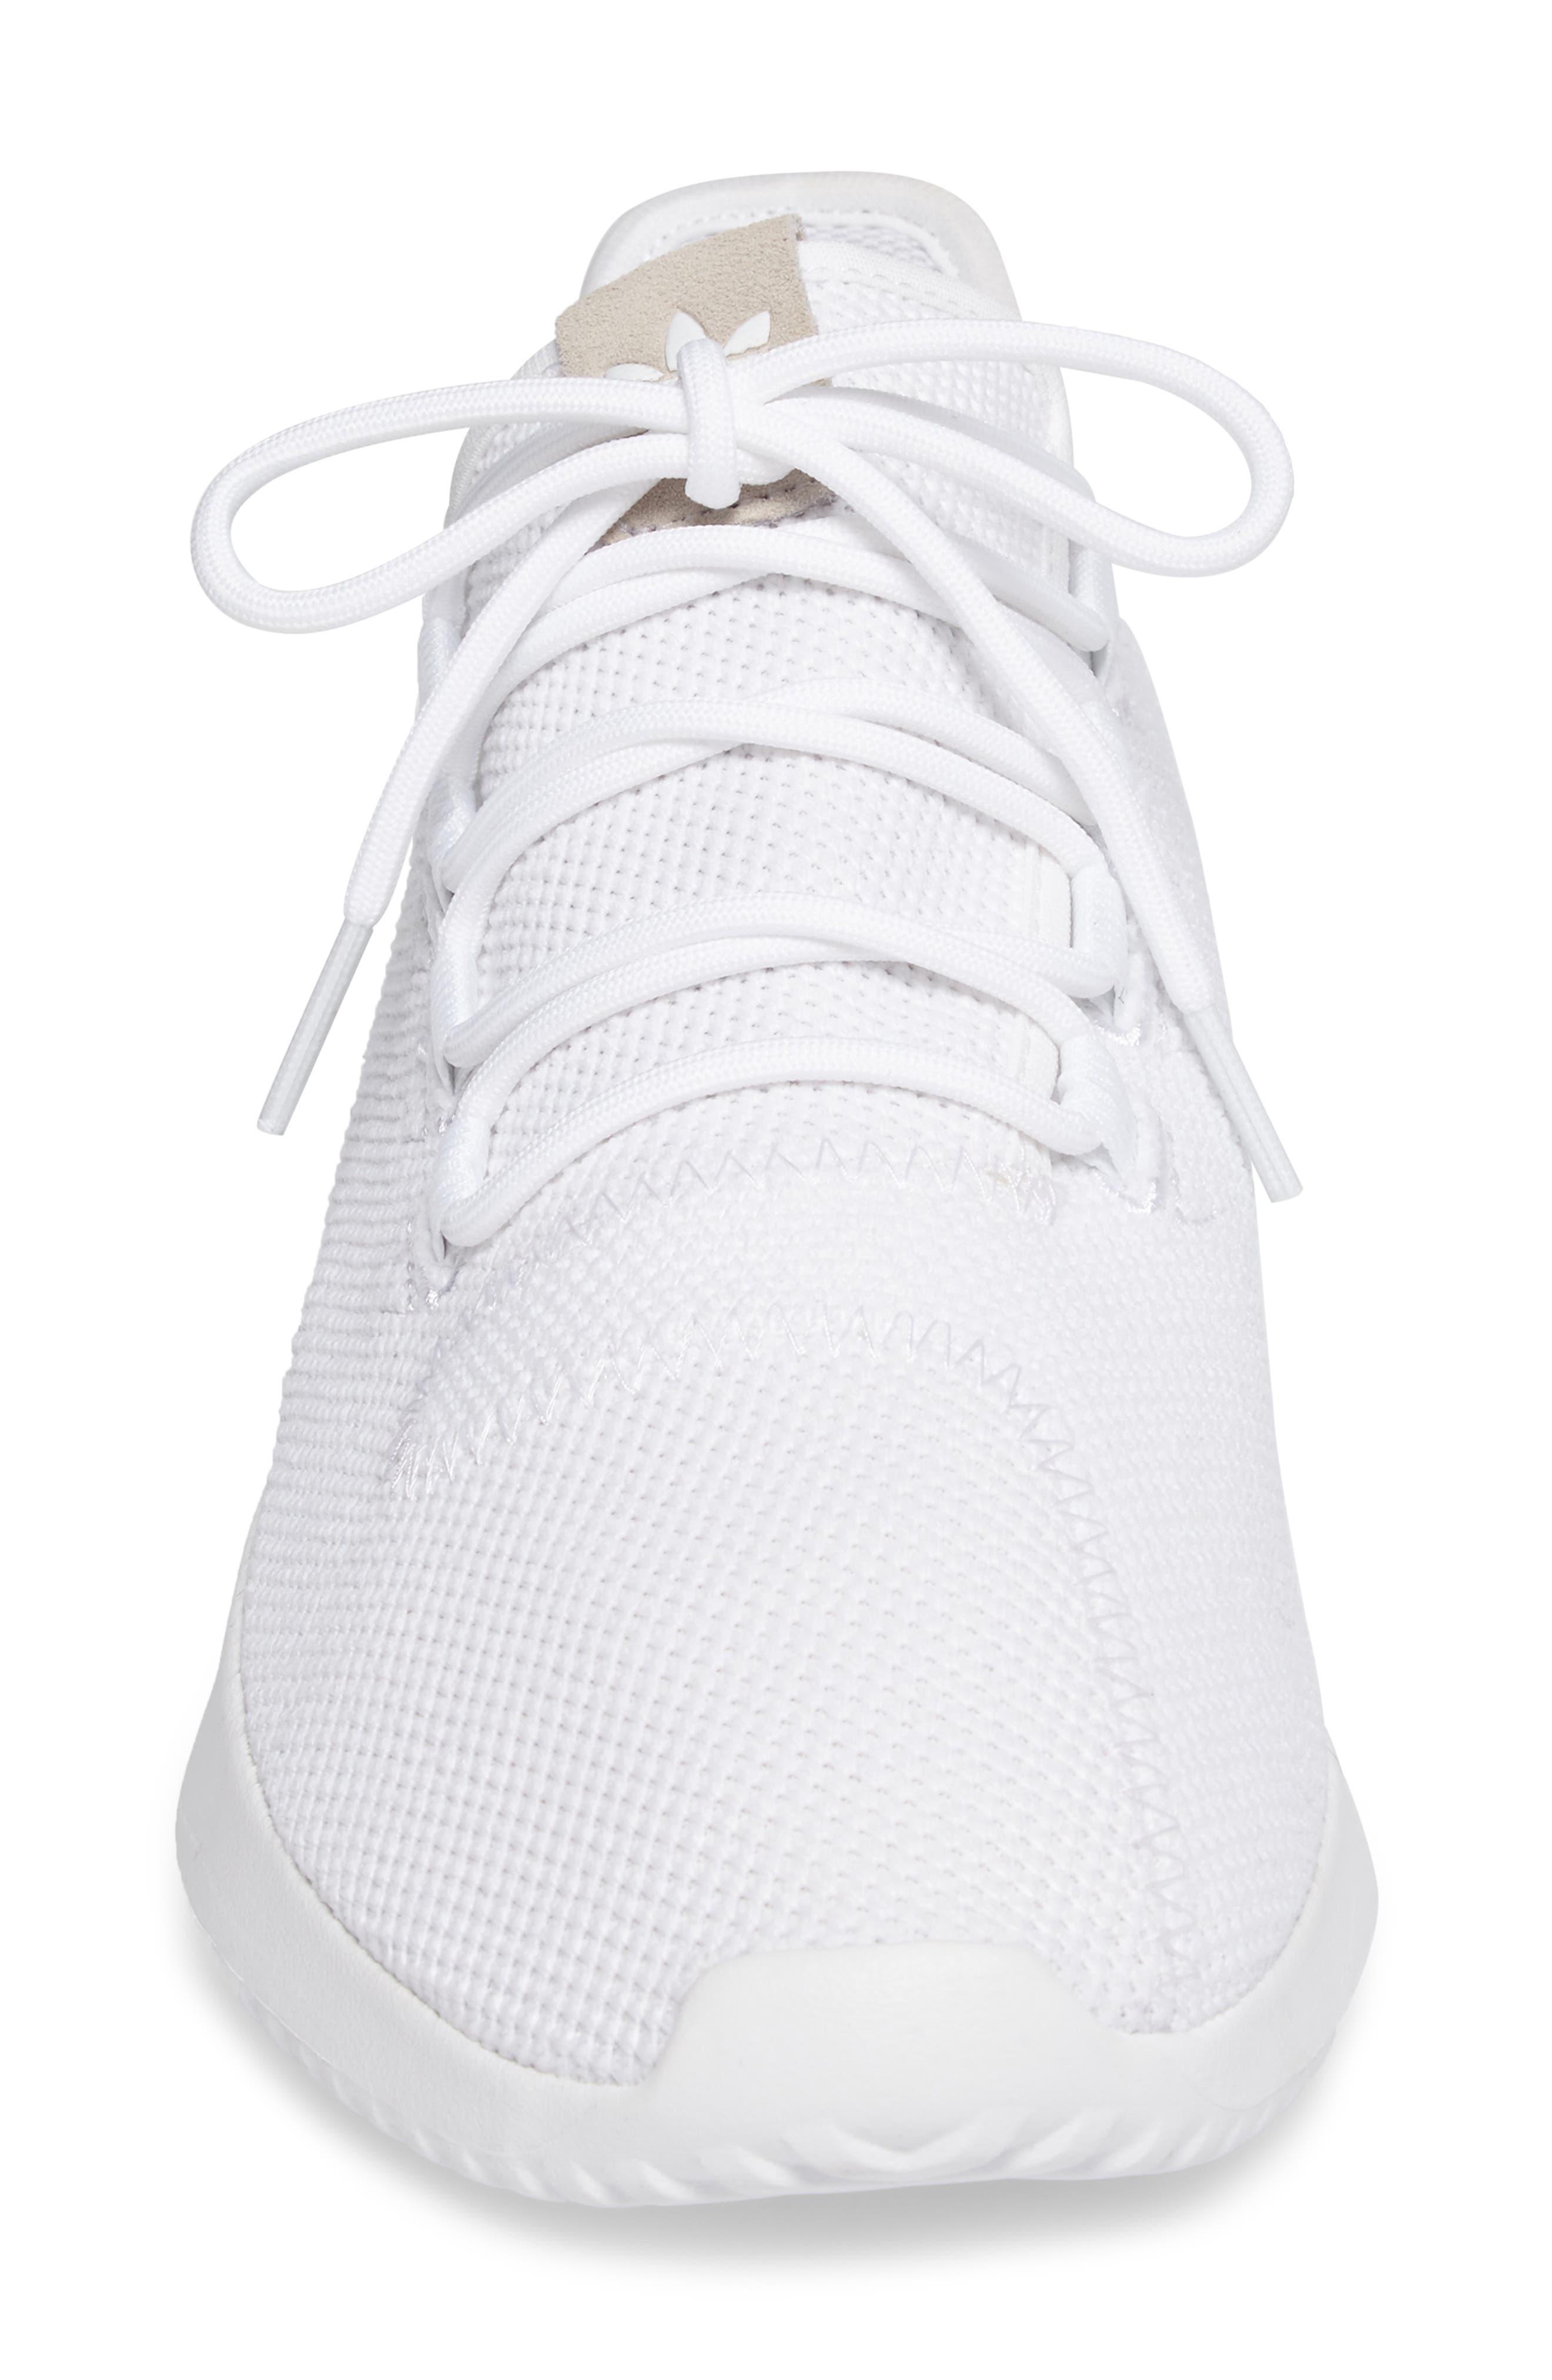 Tubular Shadow Sneaker,                             Alternate thumbnail 4, color,                             White/ Core Black/ White